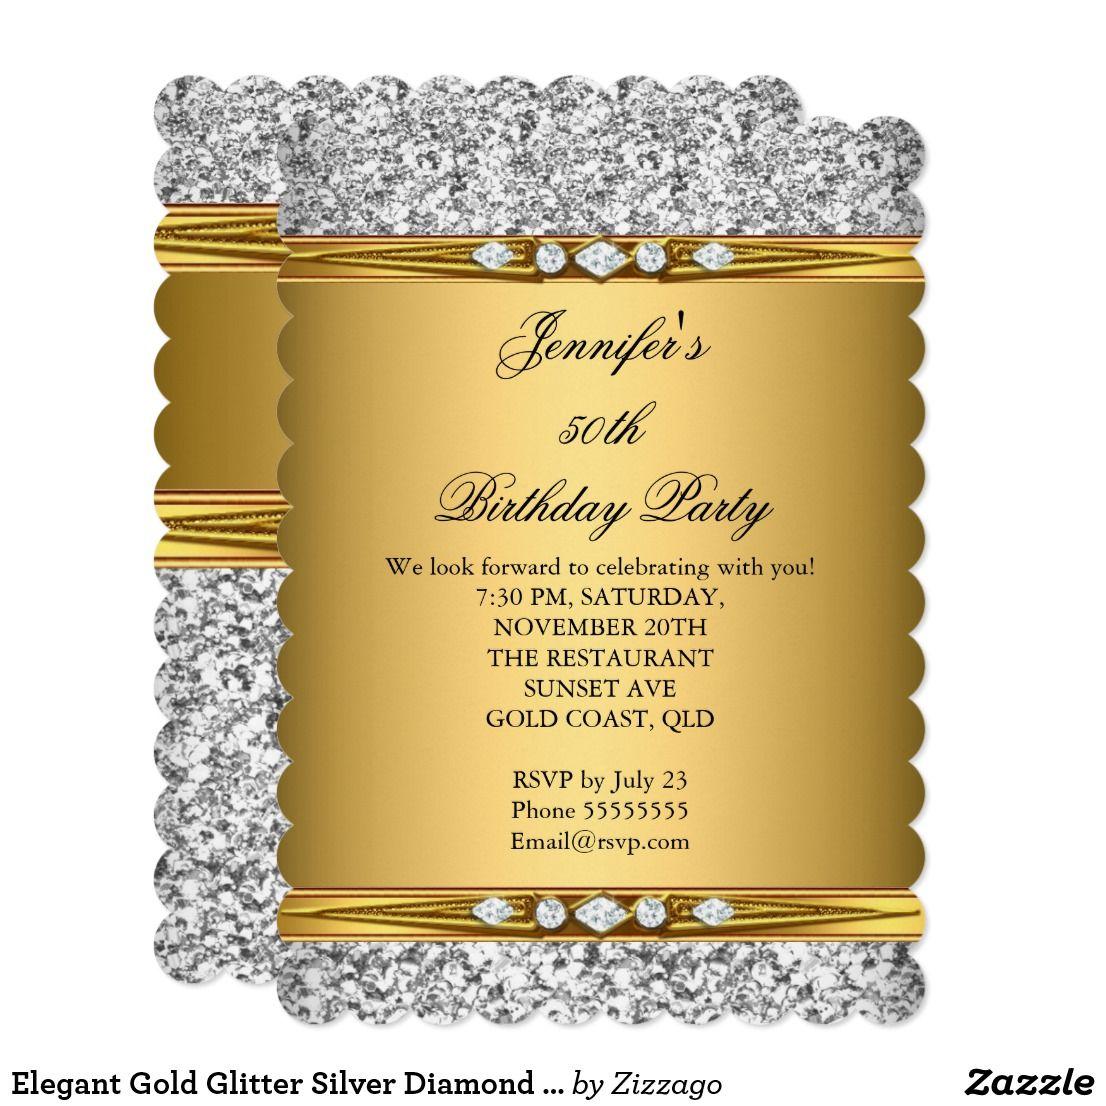 Elegant gold glitter silver diamond birthday party card elegant gold elegant gold glitter silver diamond birthday party card elegant gold glitter silver diamond birthday party gold womans girl invitation formal stopboris Choice Image